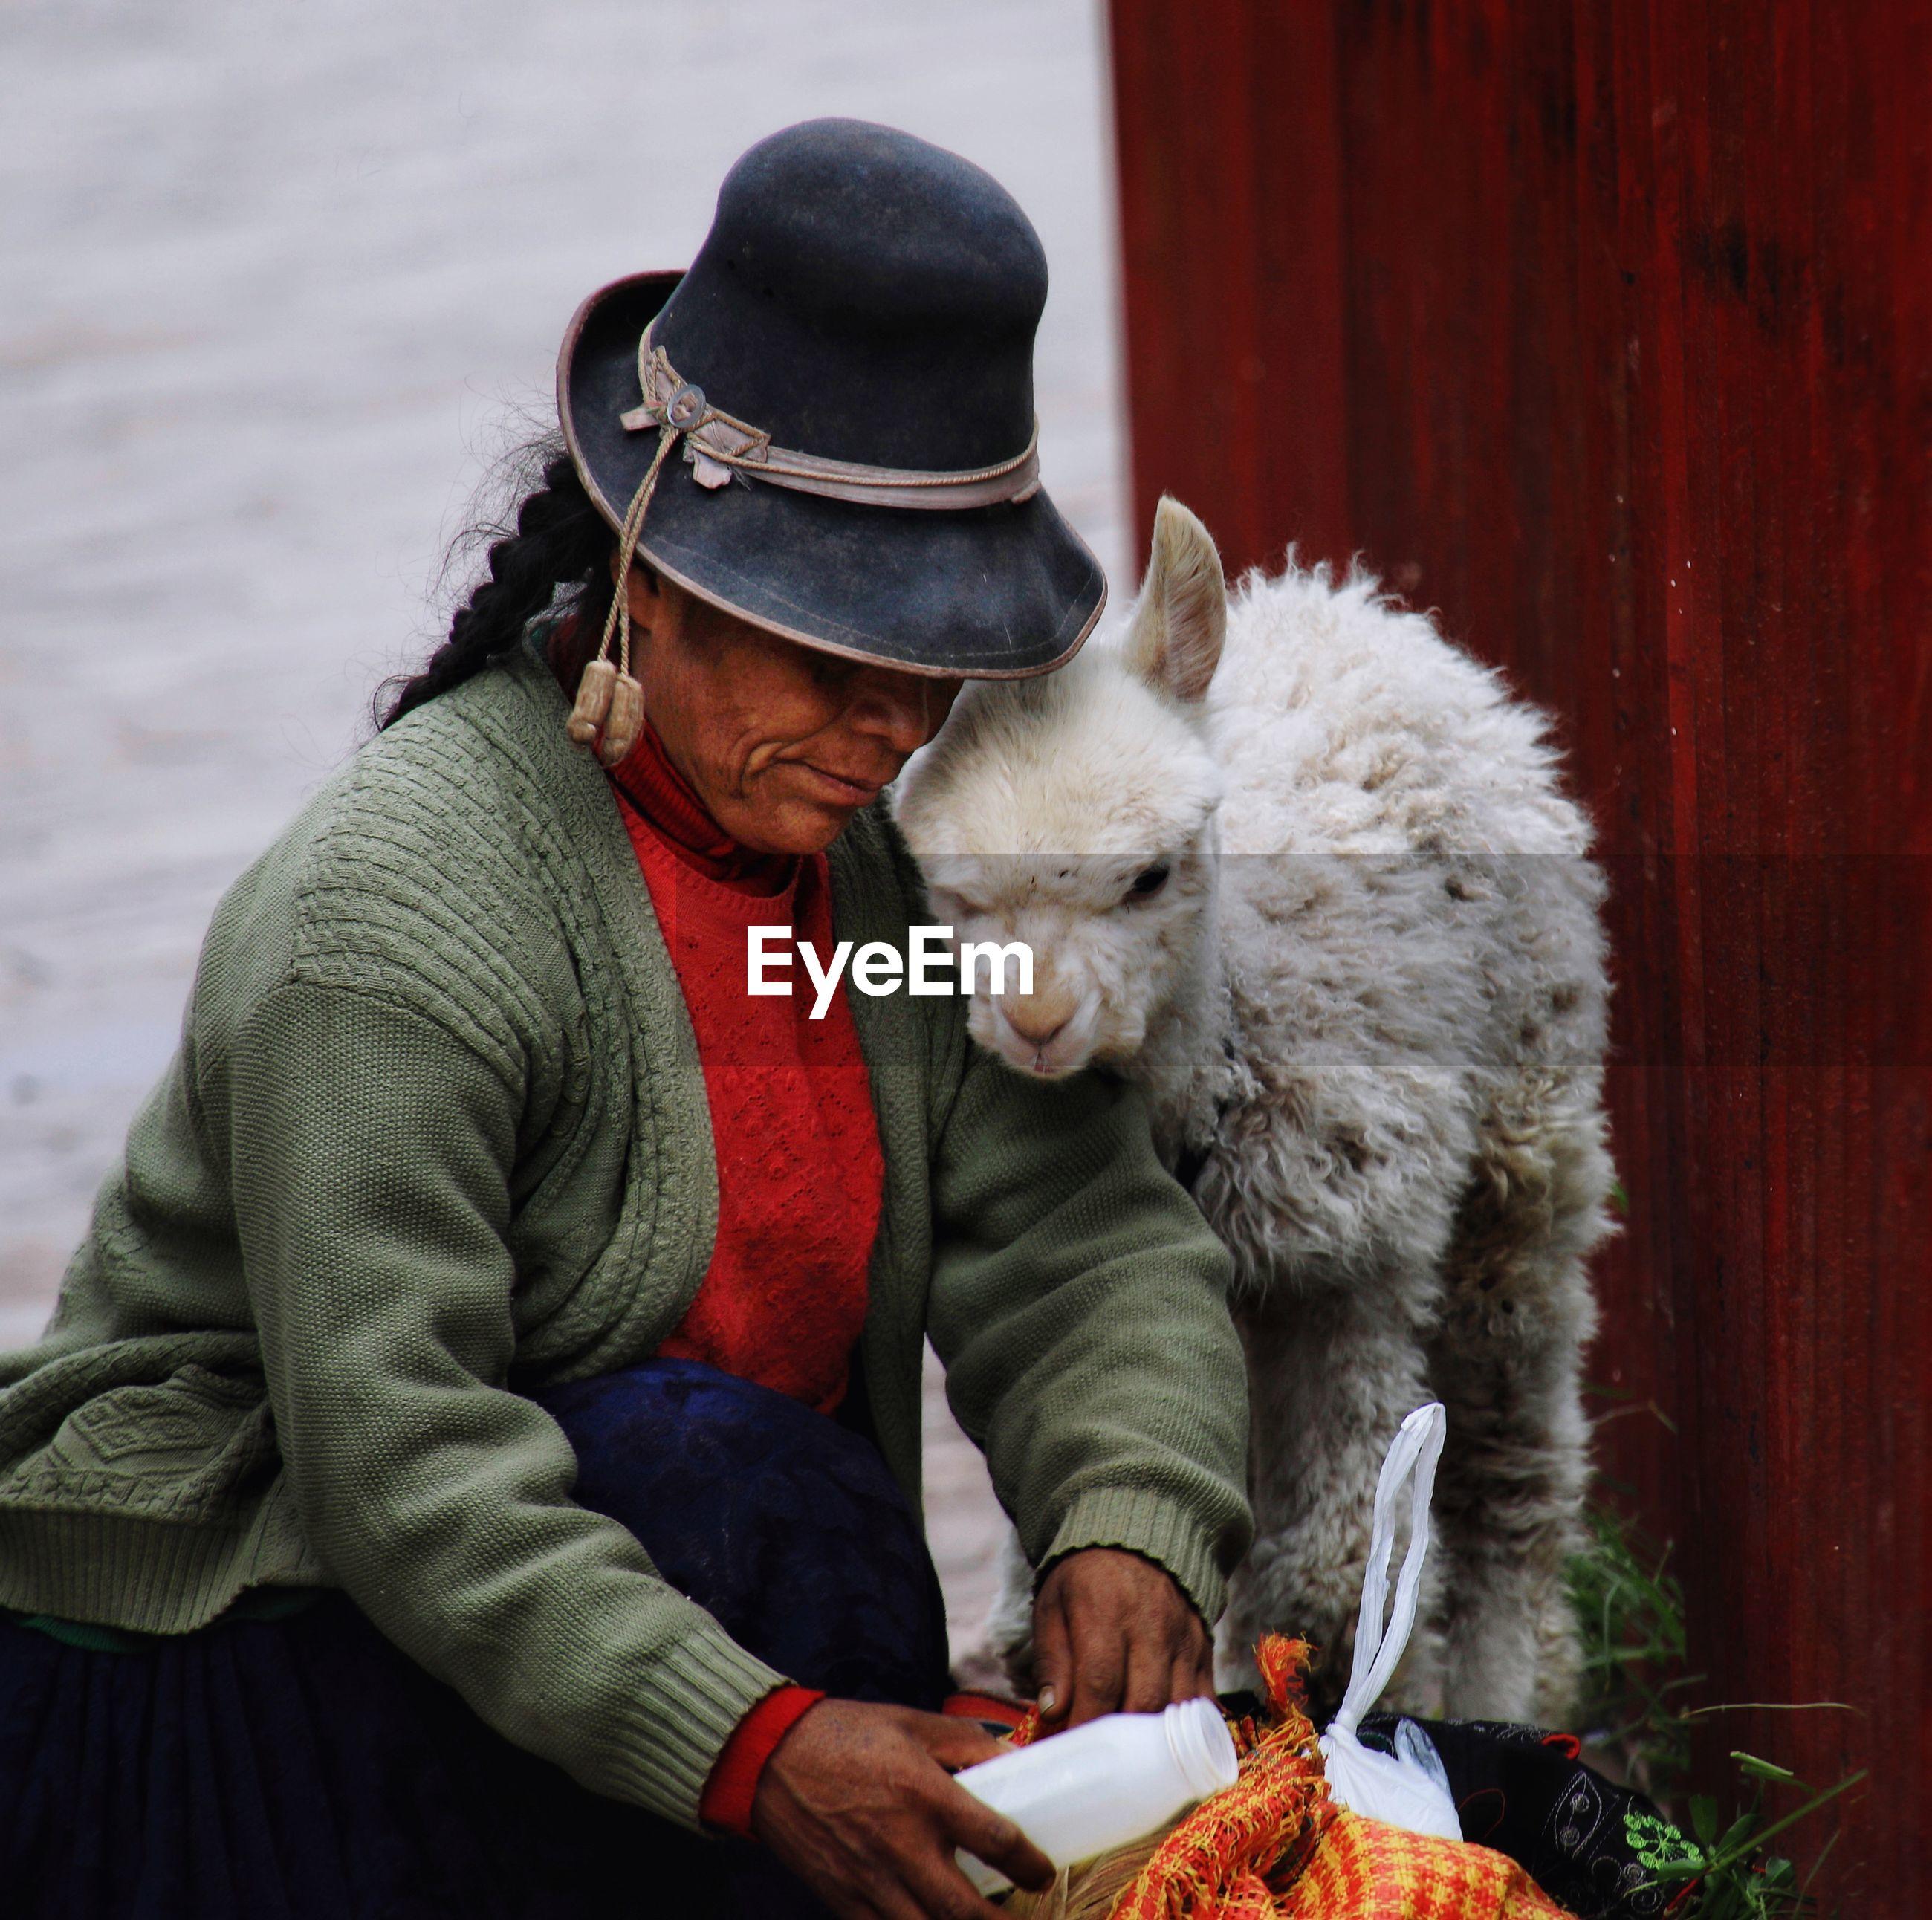 MAN HOLDING UMBRELLA IN WINTER